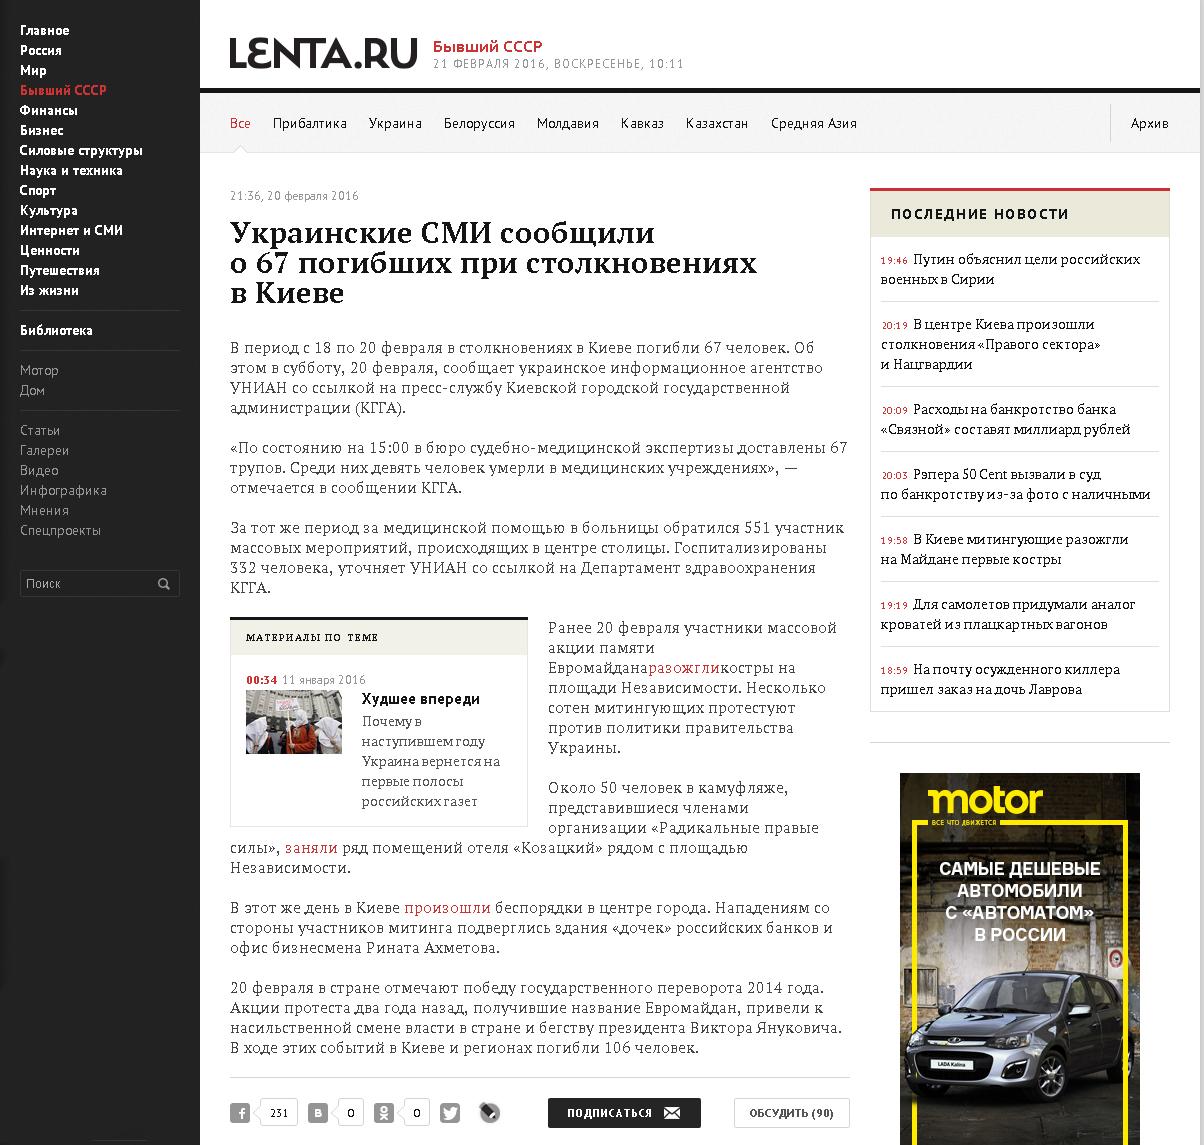 Аналитика: РоssоСМИ фальстартанули: ожидали 67 погибших на кремлемайдане, ссылаясь на ИА Коломойского (кэш)